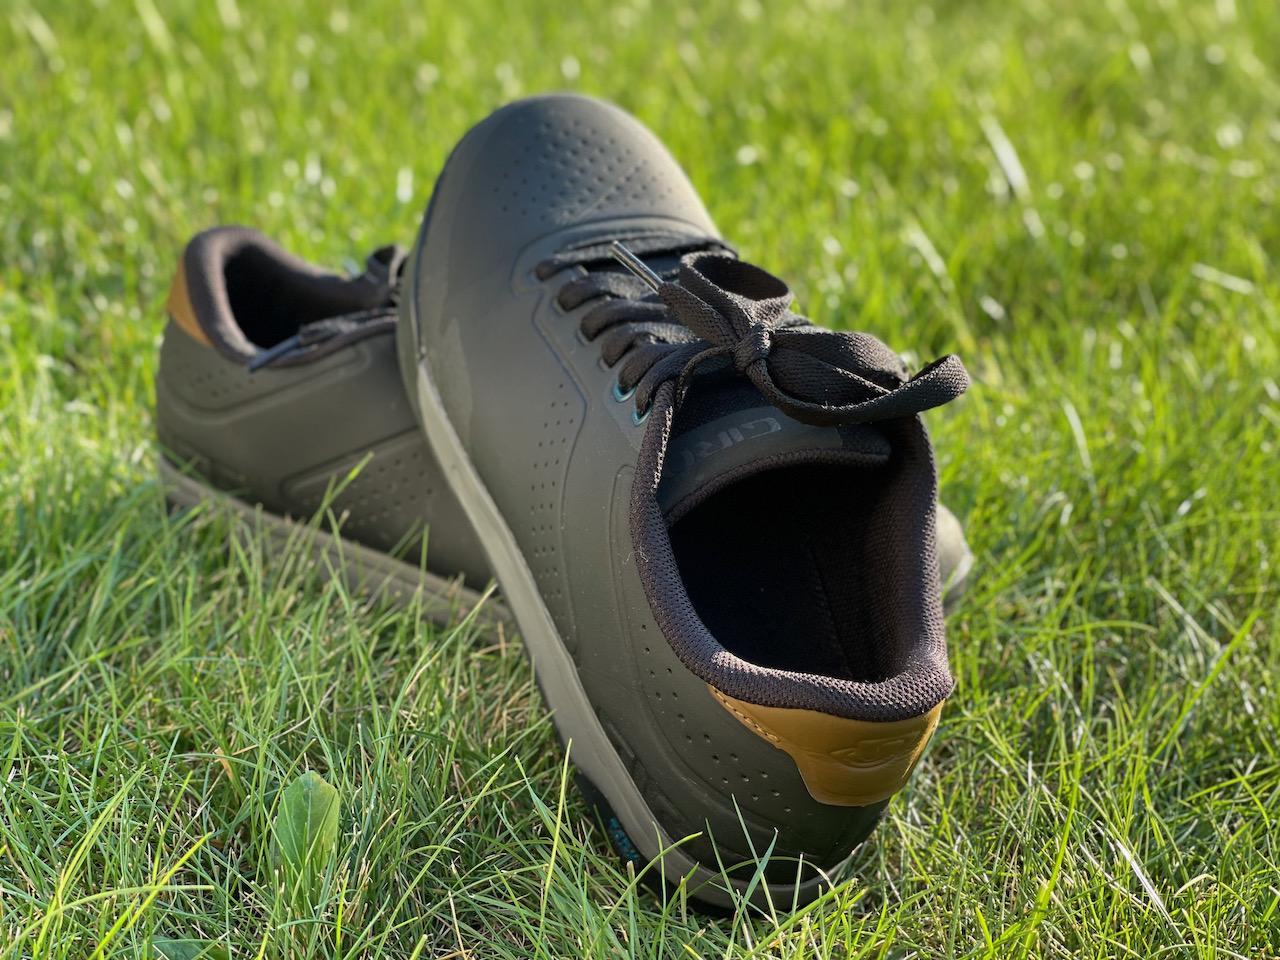 Giro Latch MTB shoes heel side